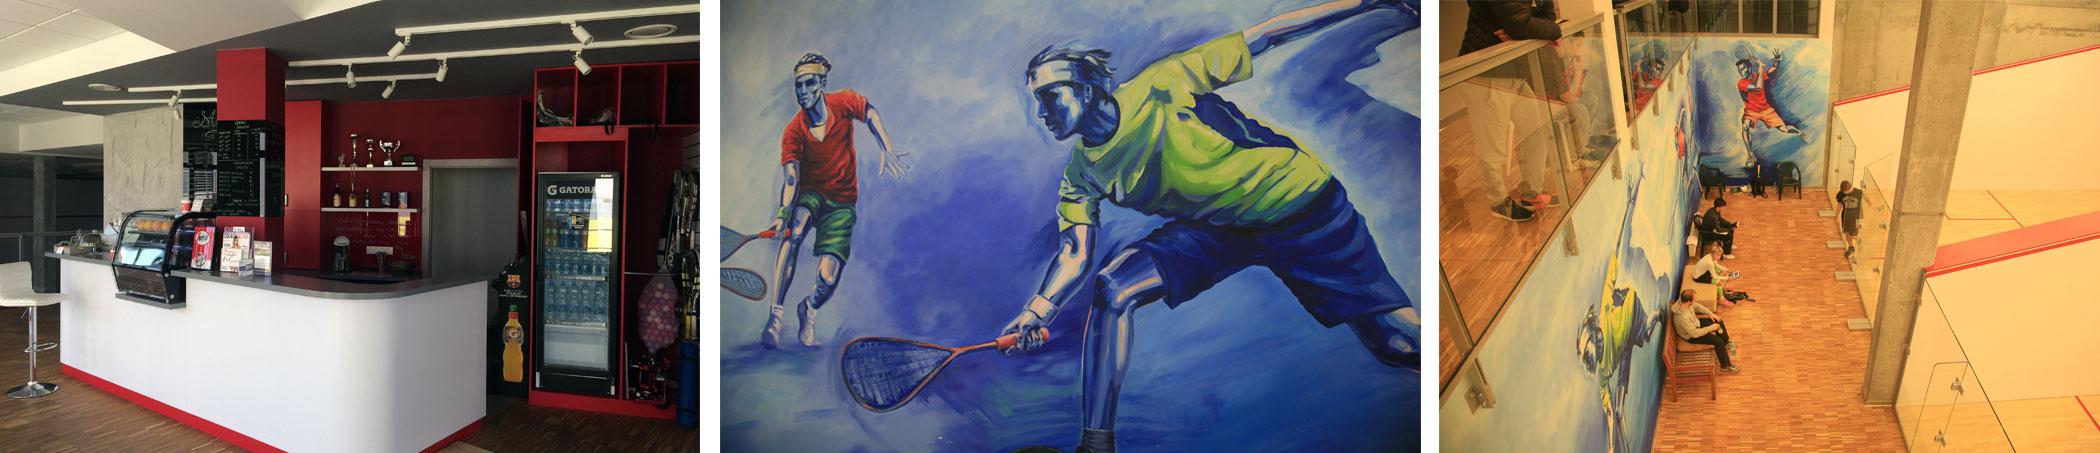 klub Stangiel Tenis & Squash